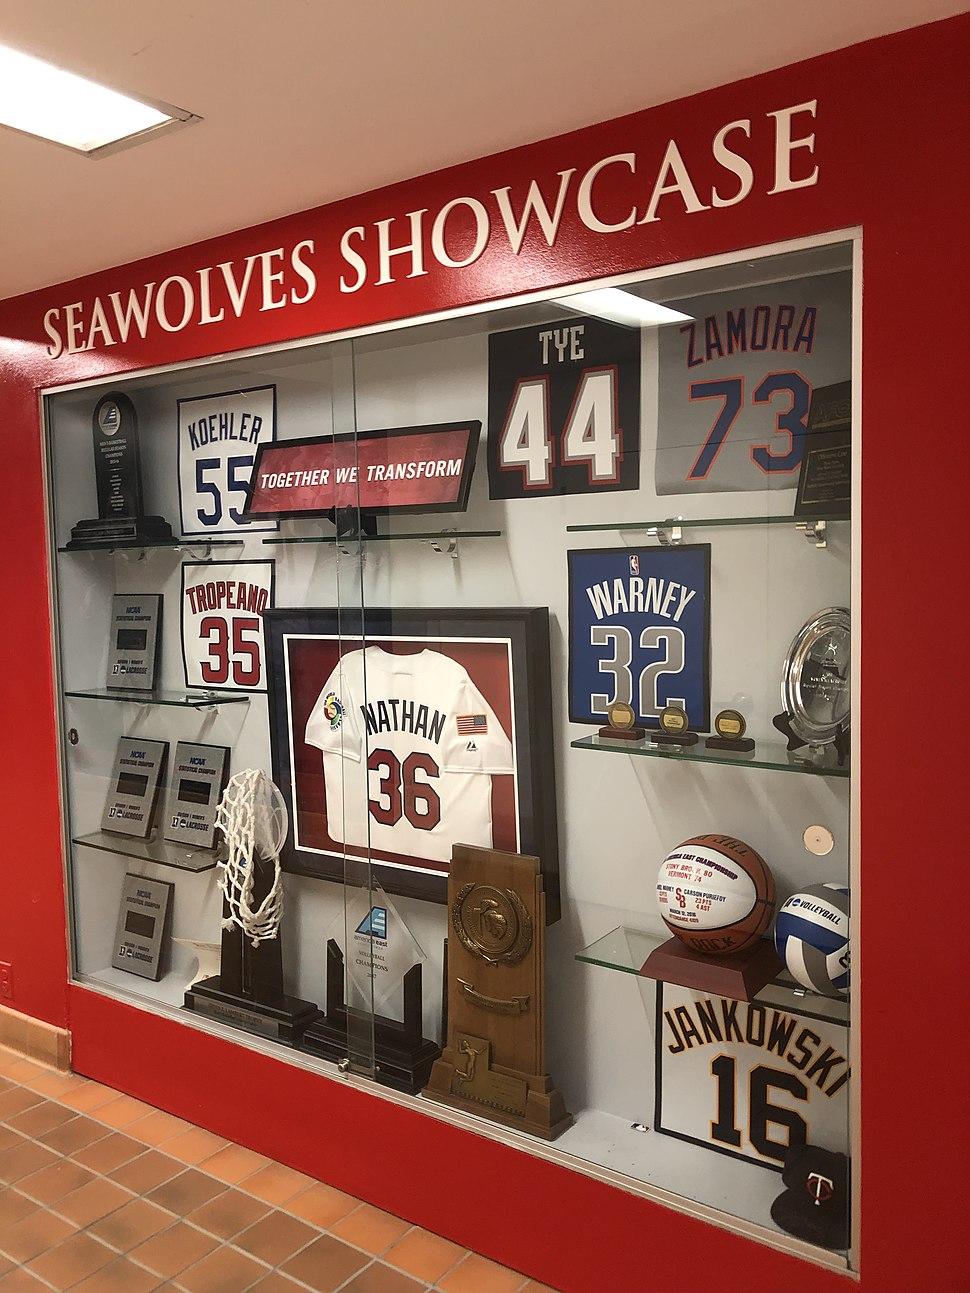 Seawolves Showcase.jpeg